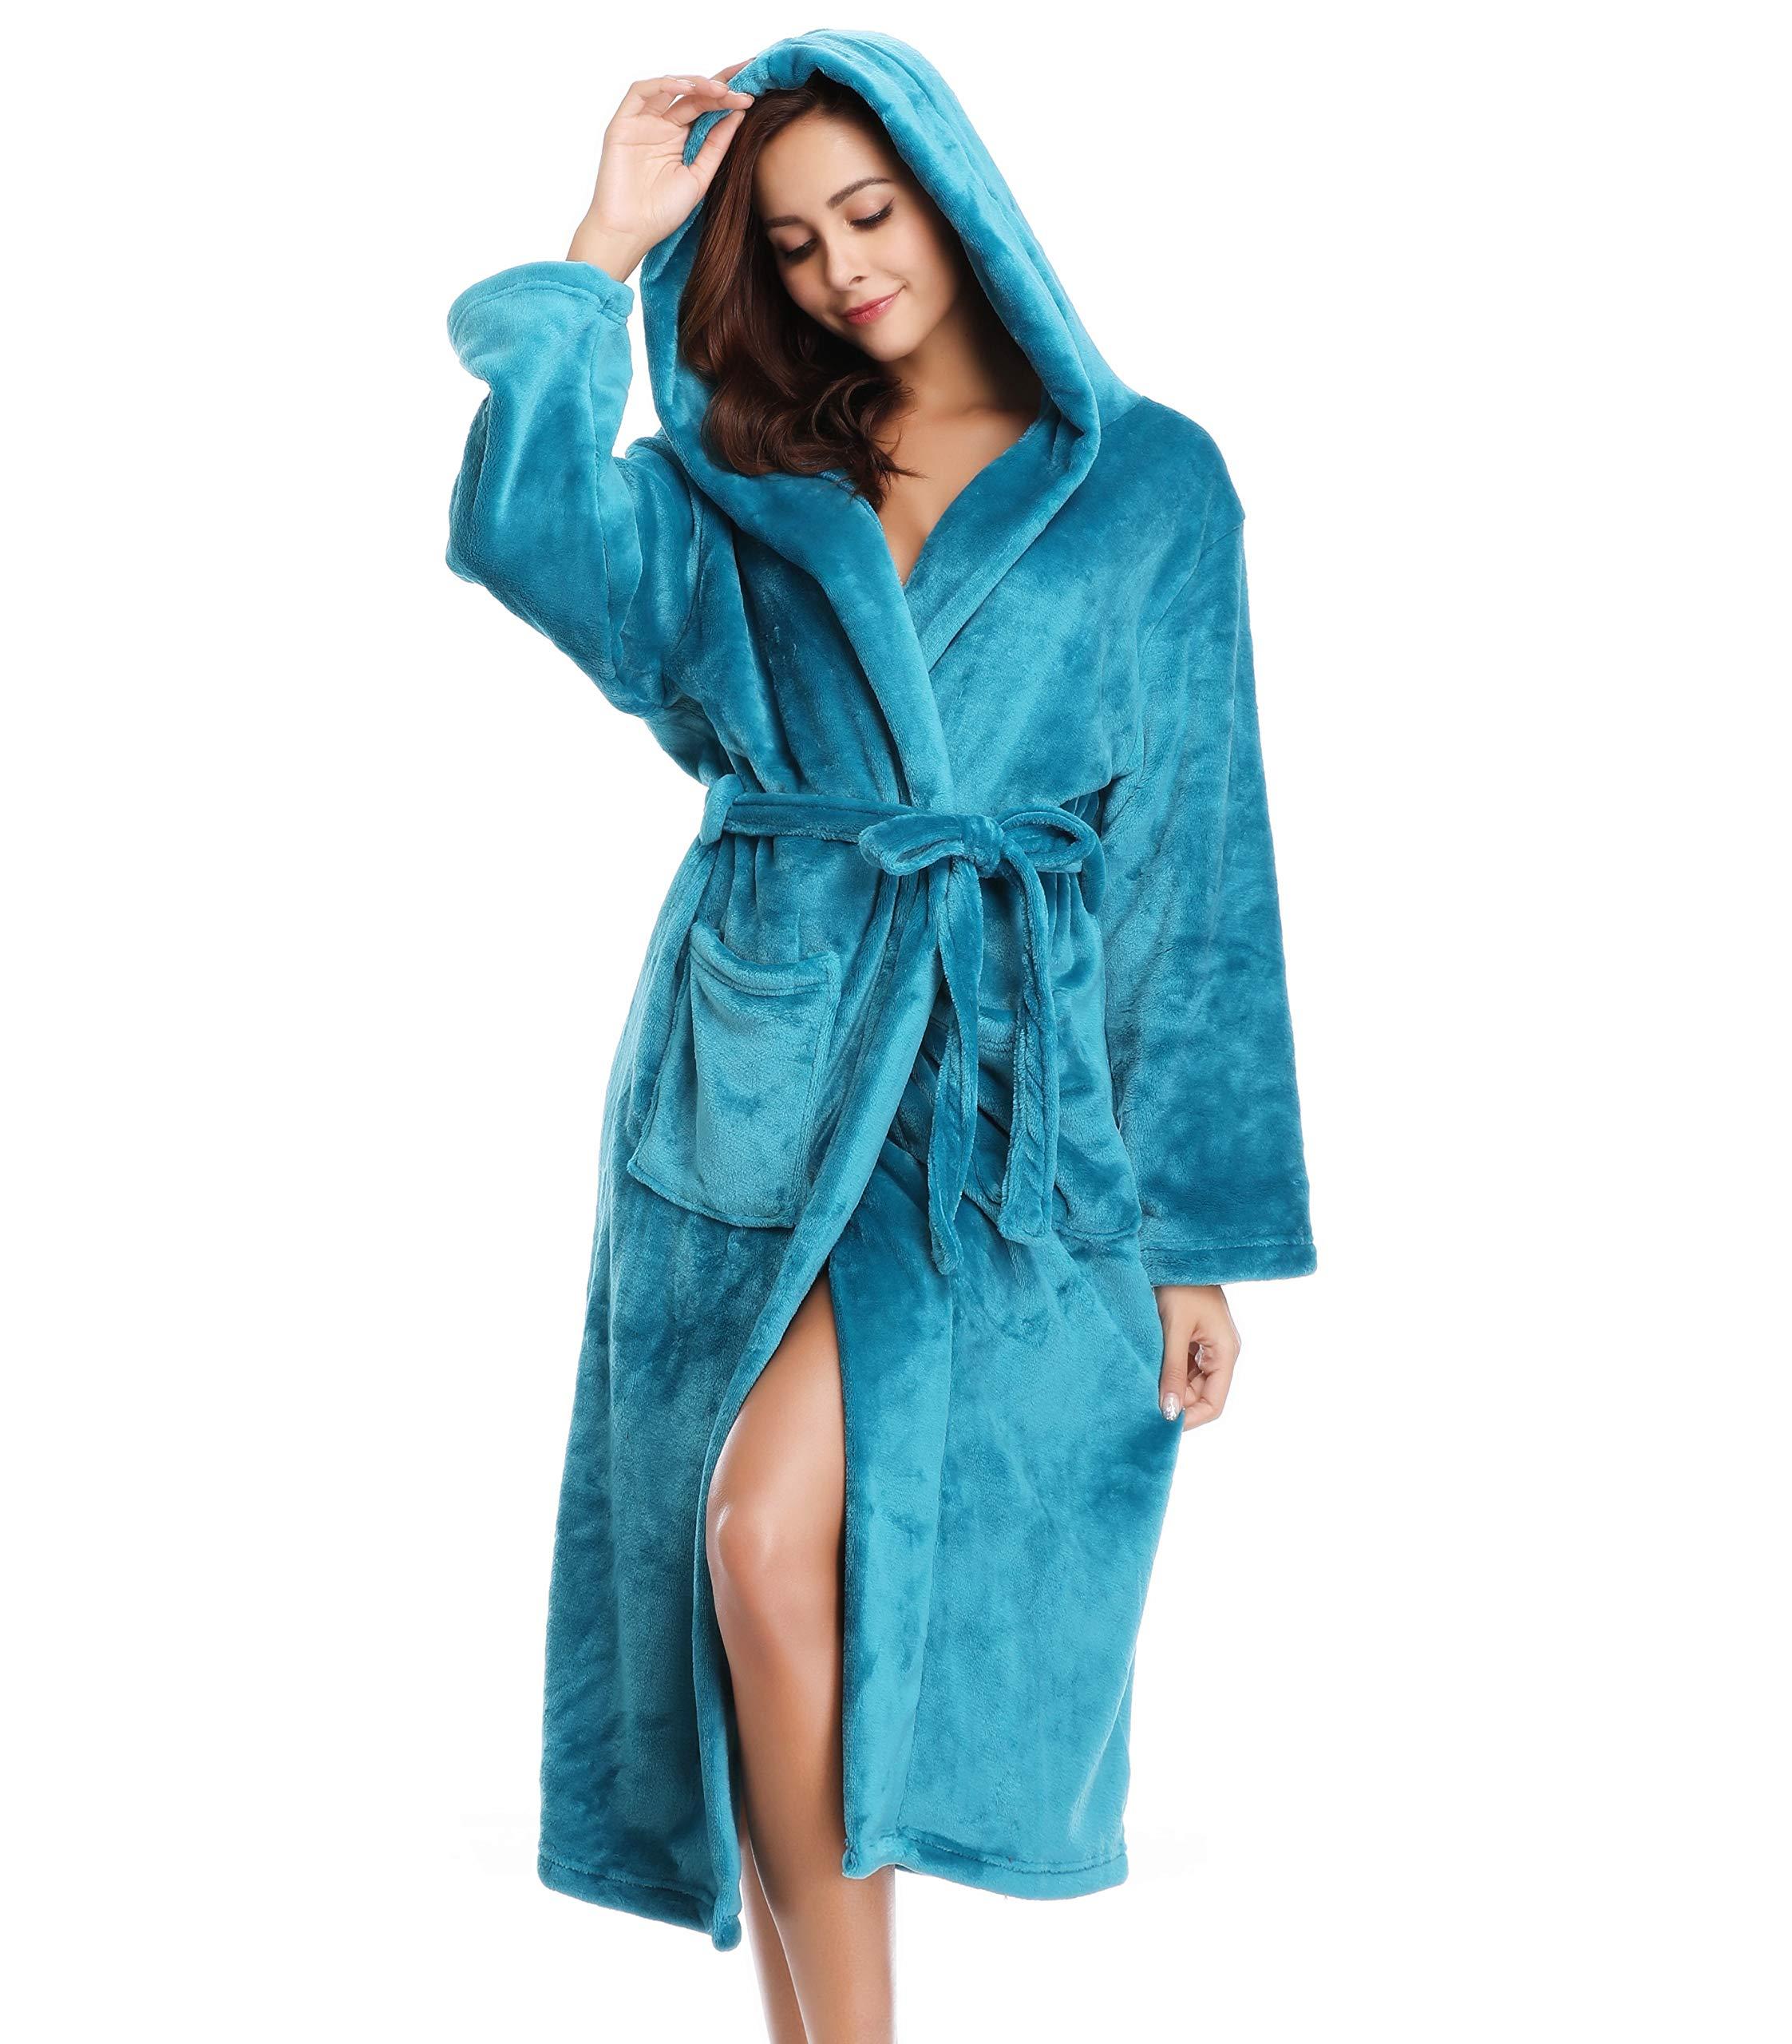 Vlazom Women's Warm Fleece Robe with Hooded, Soft Plush Bathrobe Fluffy Long House Coat